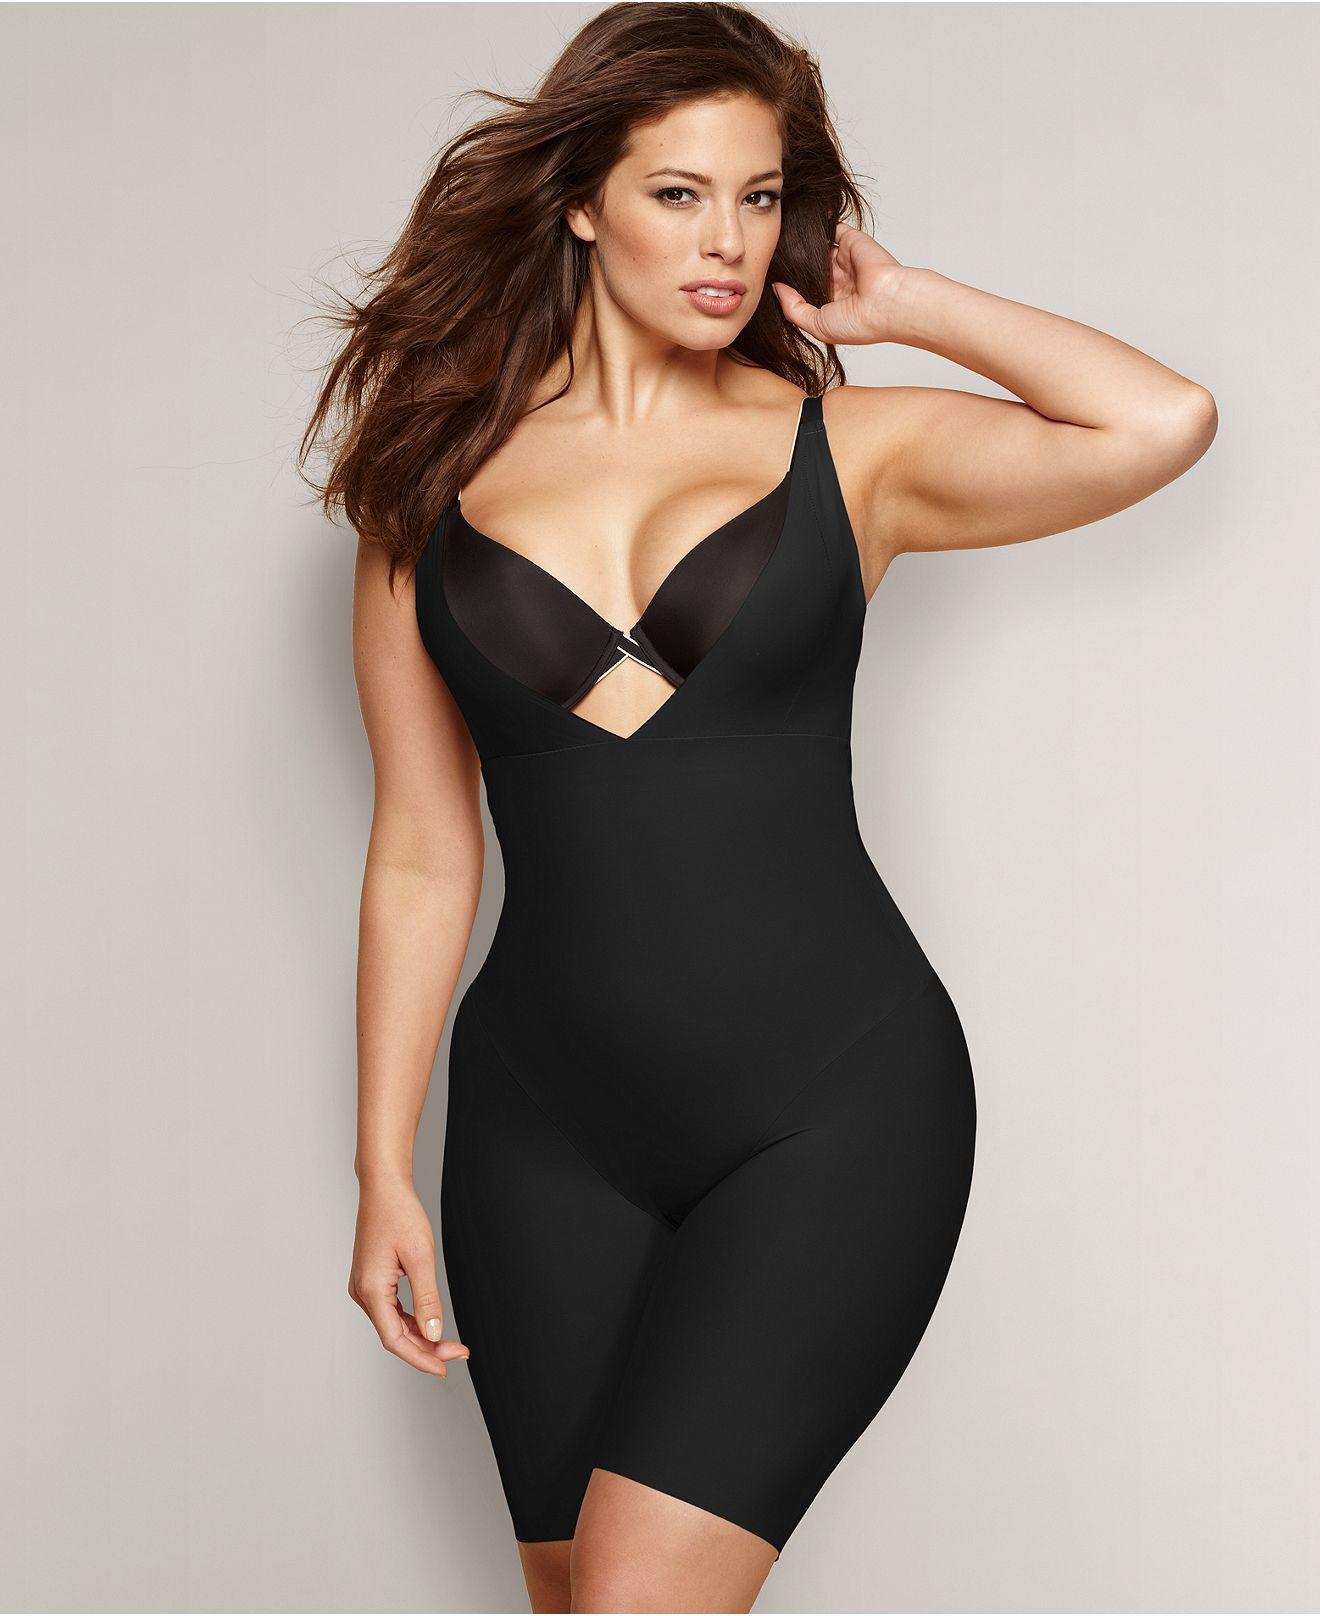 Flexees by Maidenform Plus Size Shapewear, Wear Your Own Bra Firm ...